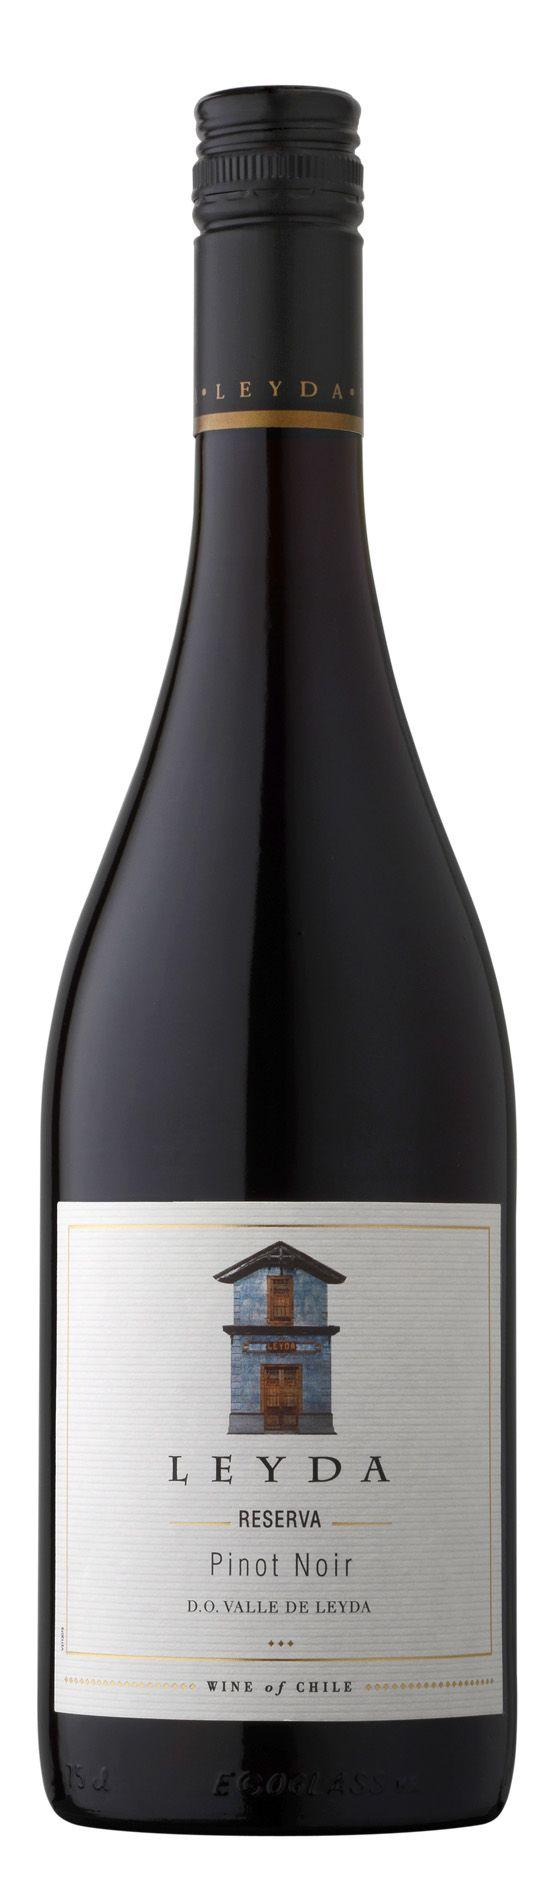 Vinho Leyda Reserva Pinot Noir